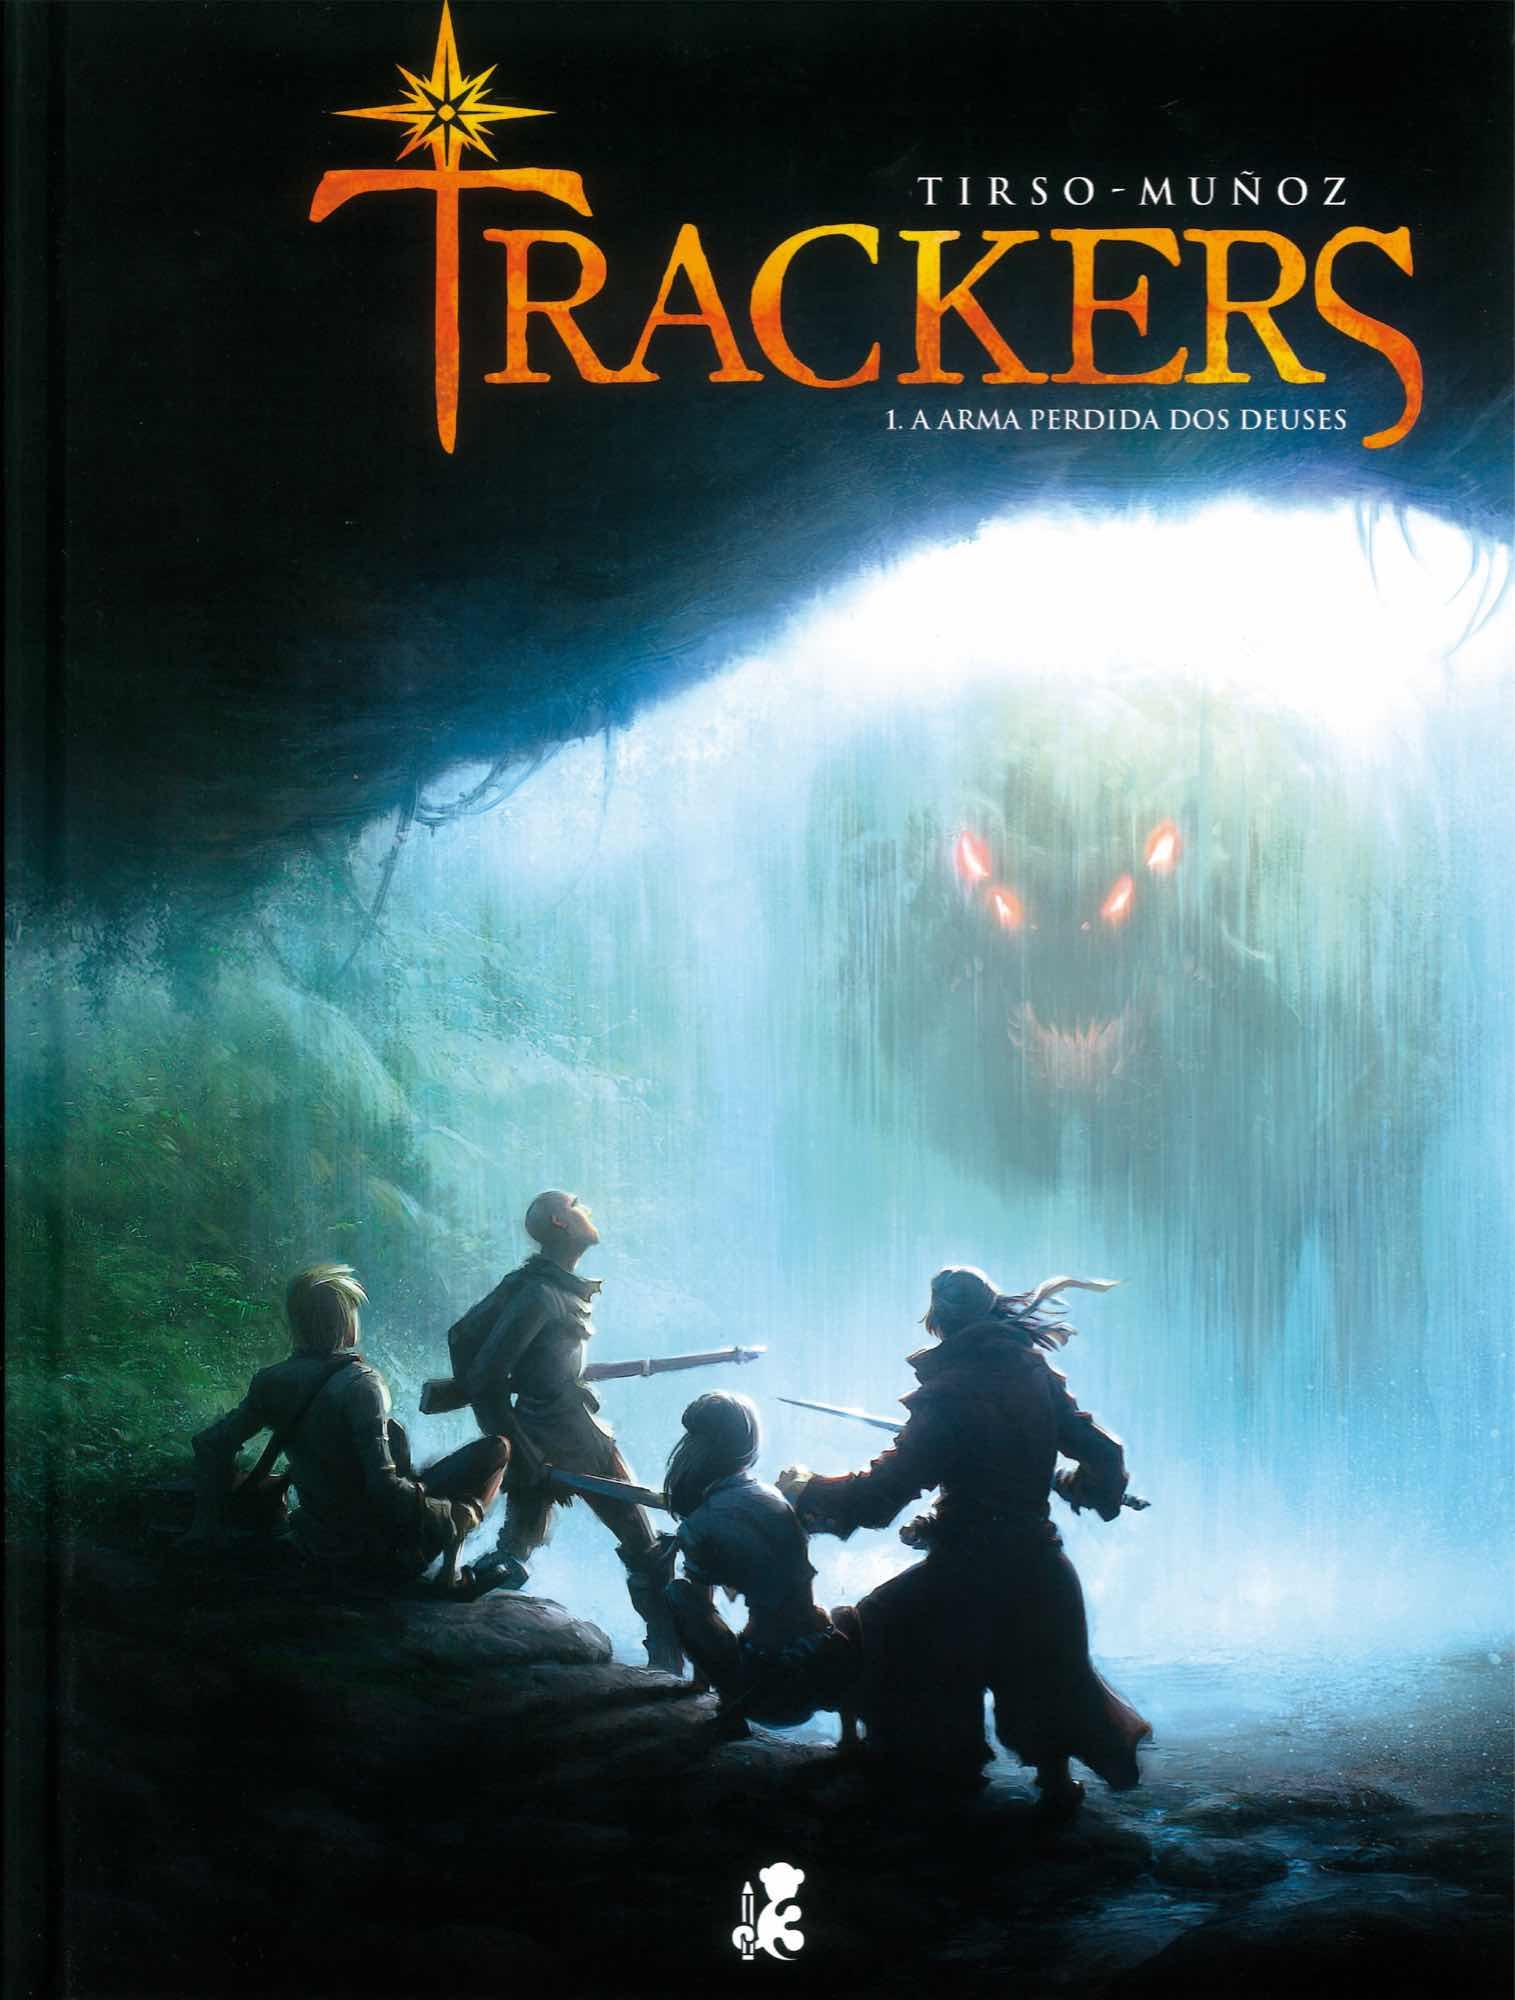 TRACKERS 01. A ARMA PERDIDA DOS DEUSES  (GALEGO)